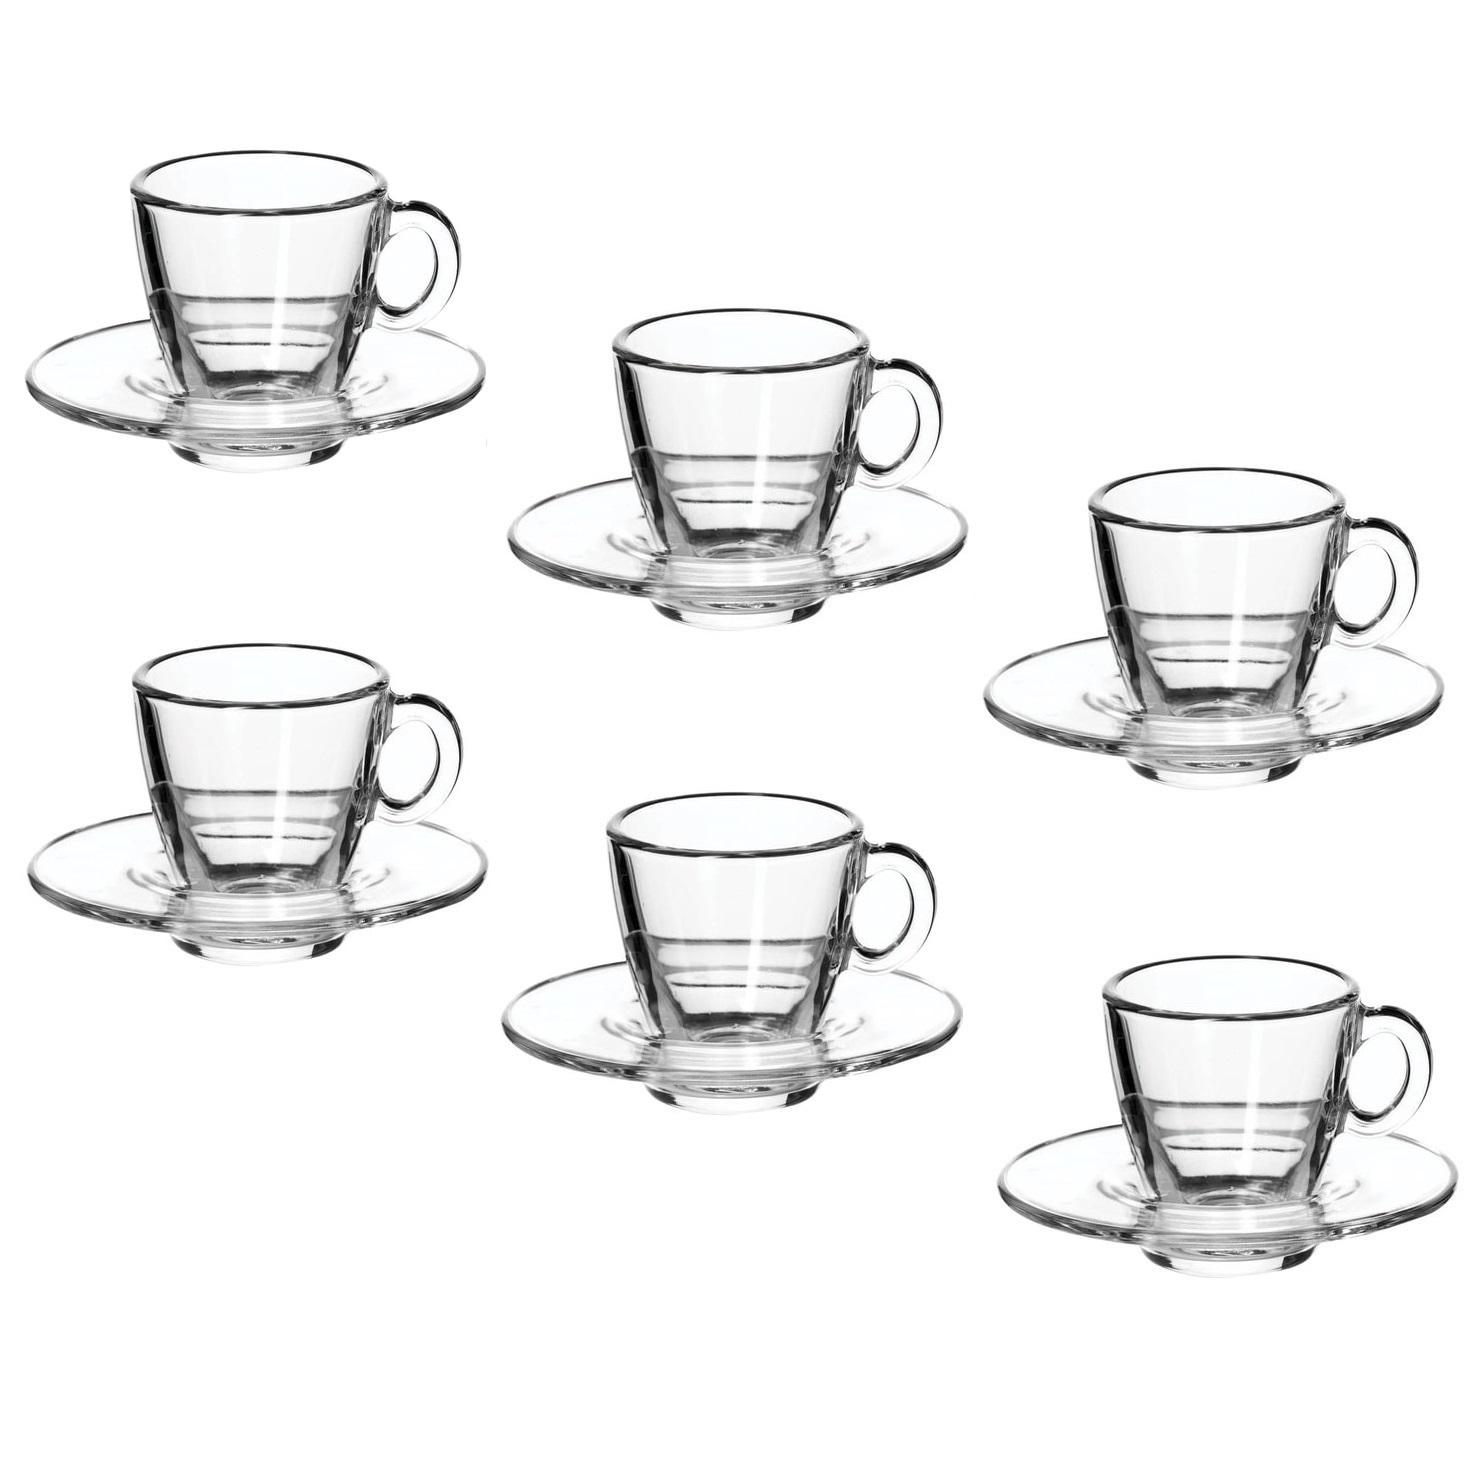 Кофейный набор Aqua на 6 персон, 72 мл